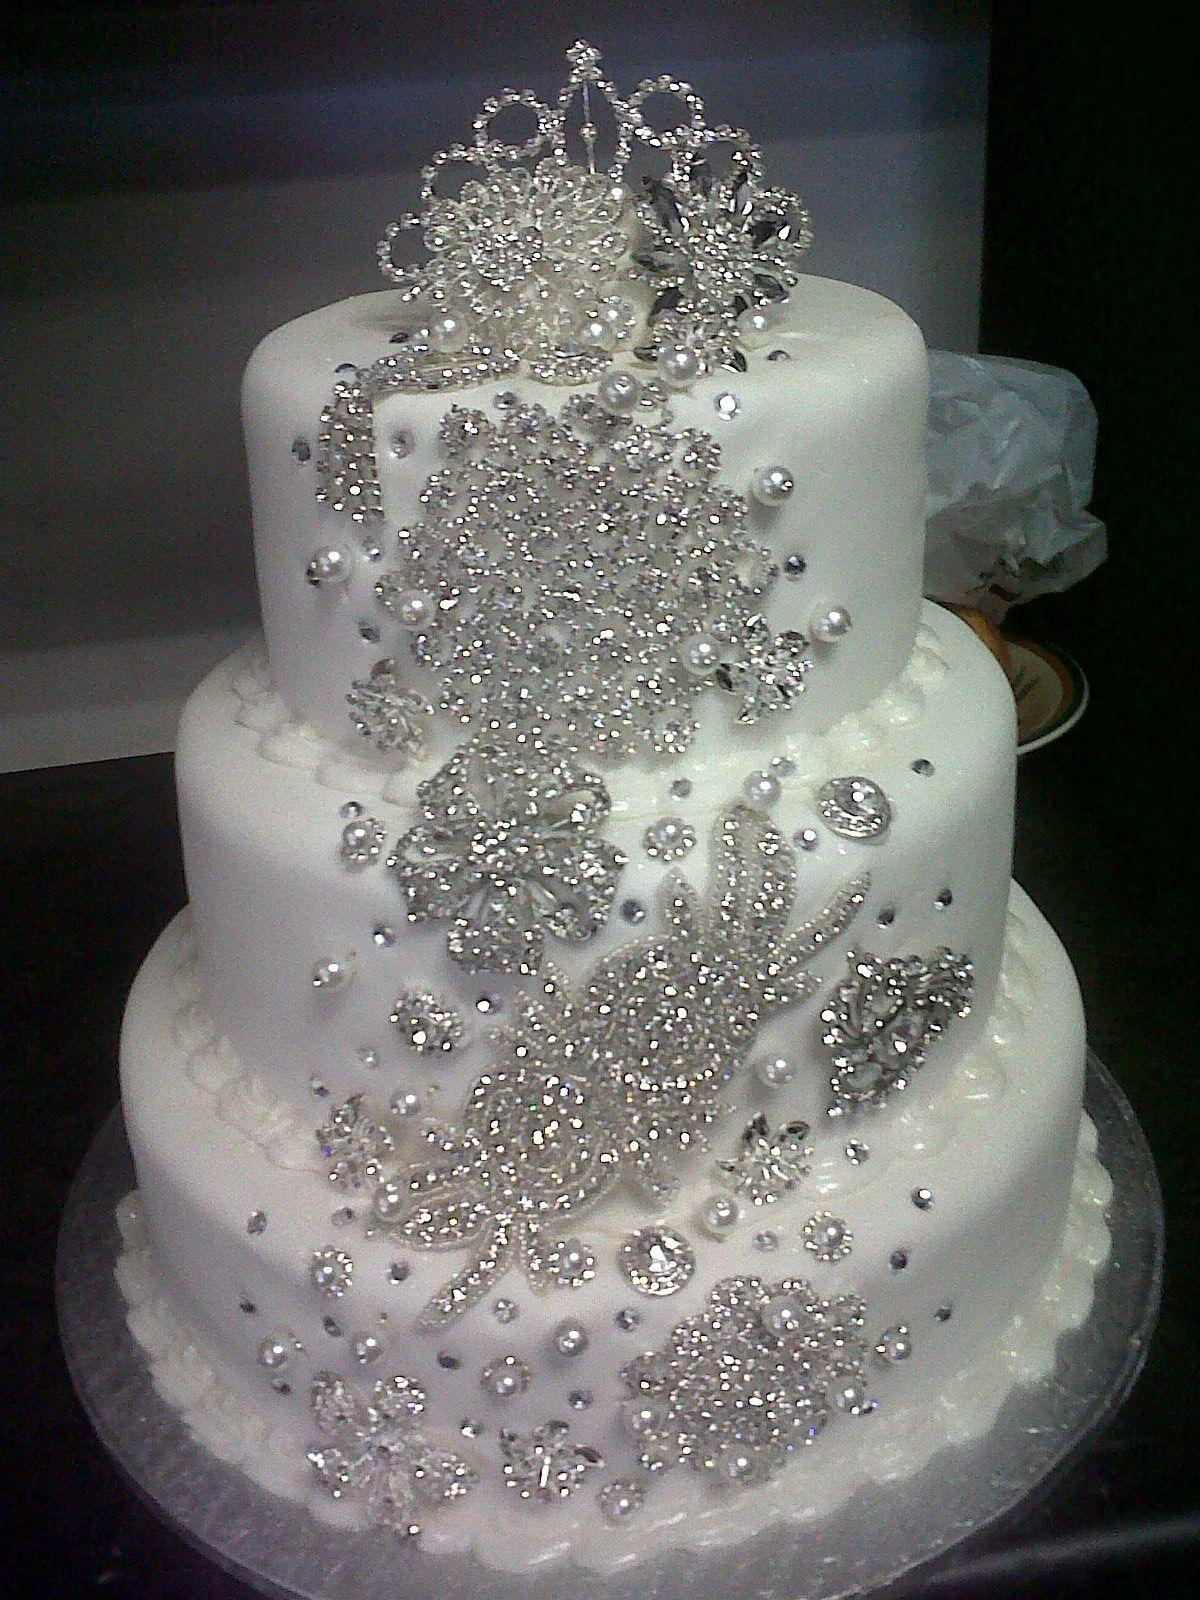 bling cake wow love it delightful cakes pinterest bling cake and wedding cake. Black Bedroom Furniture Sets. Home Design Ideas